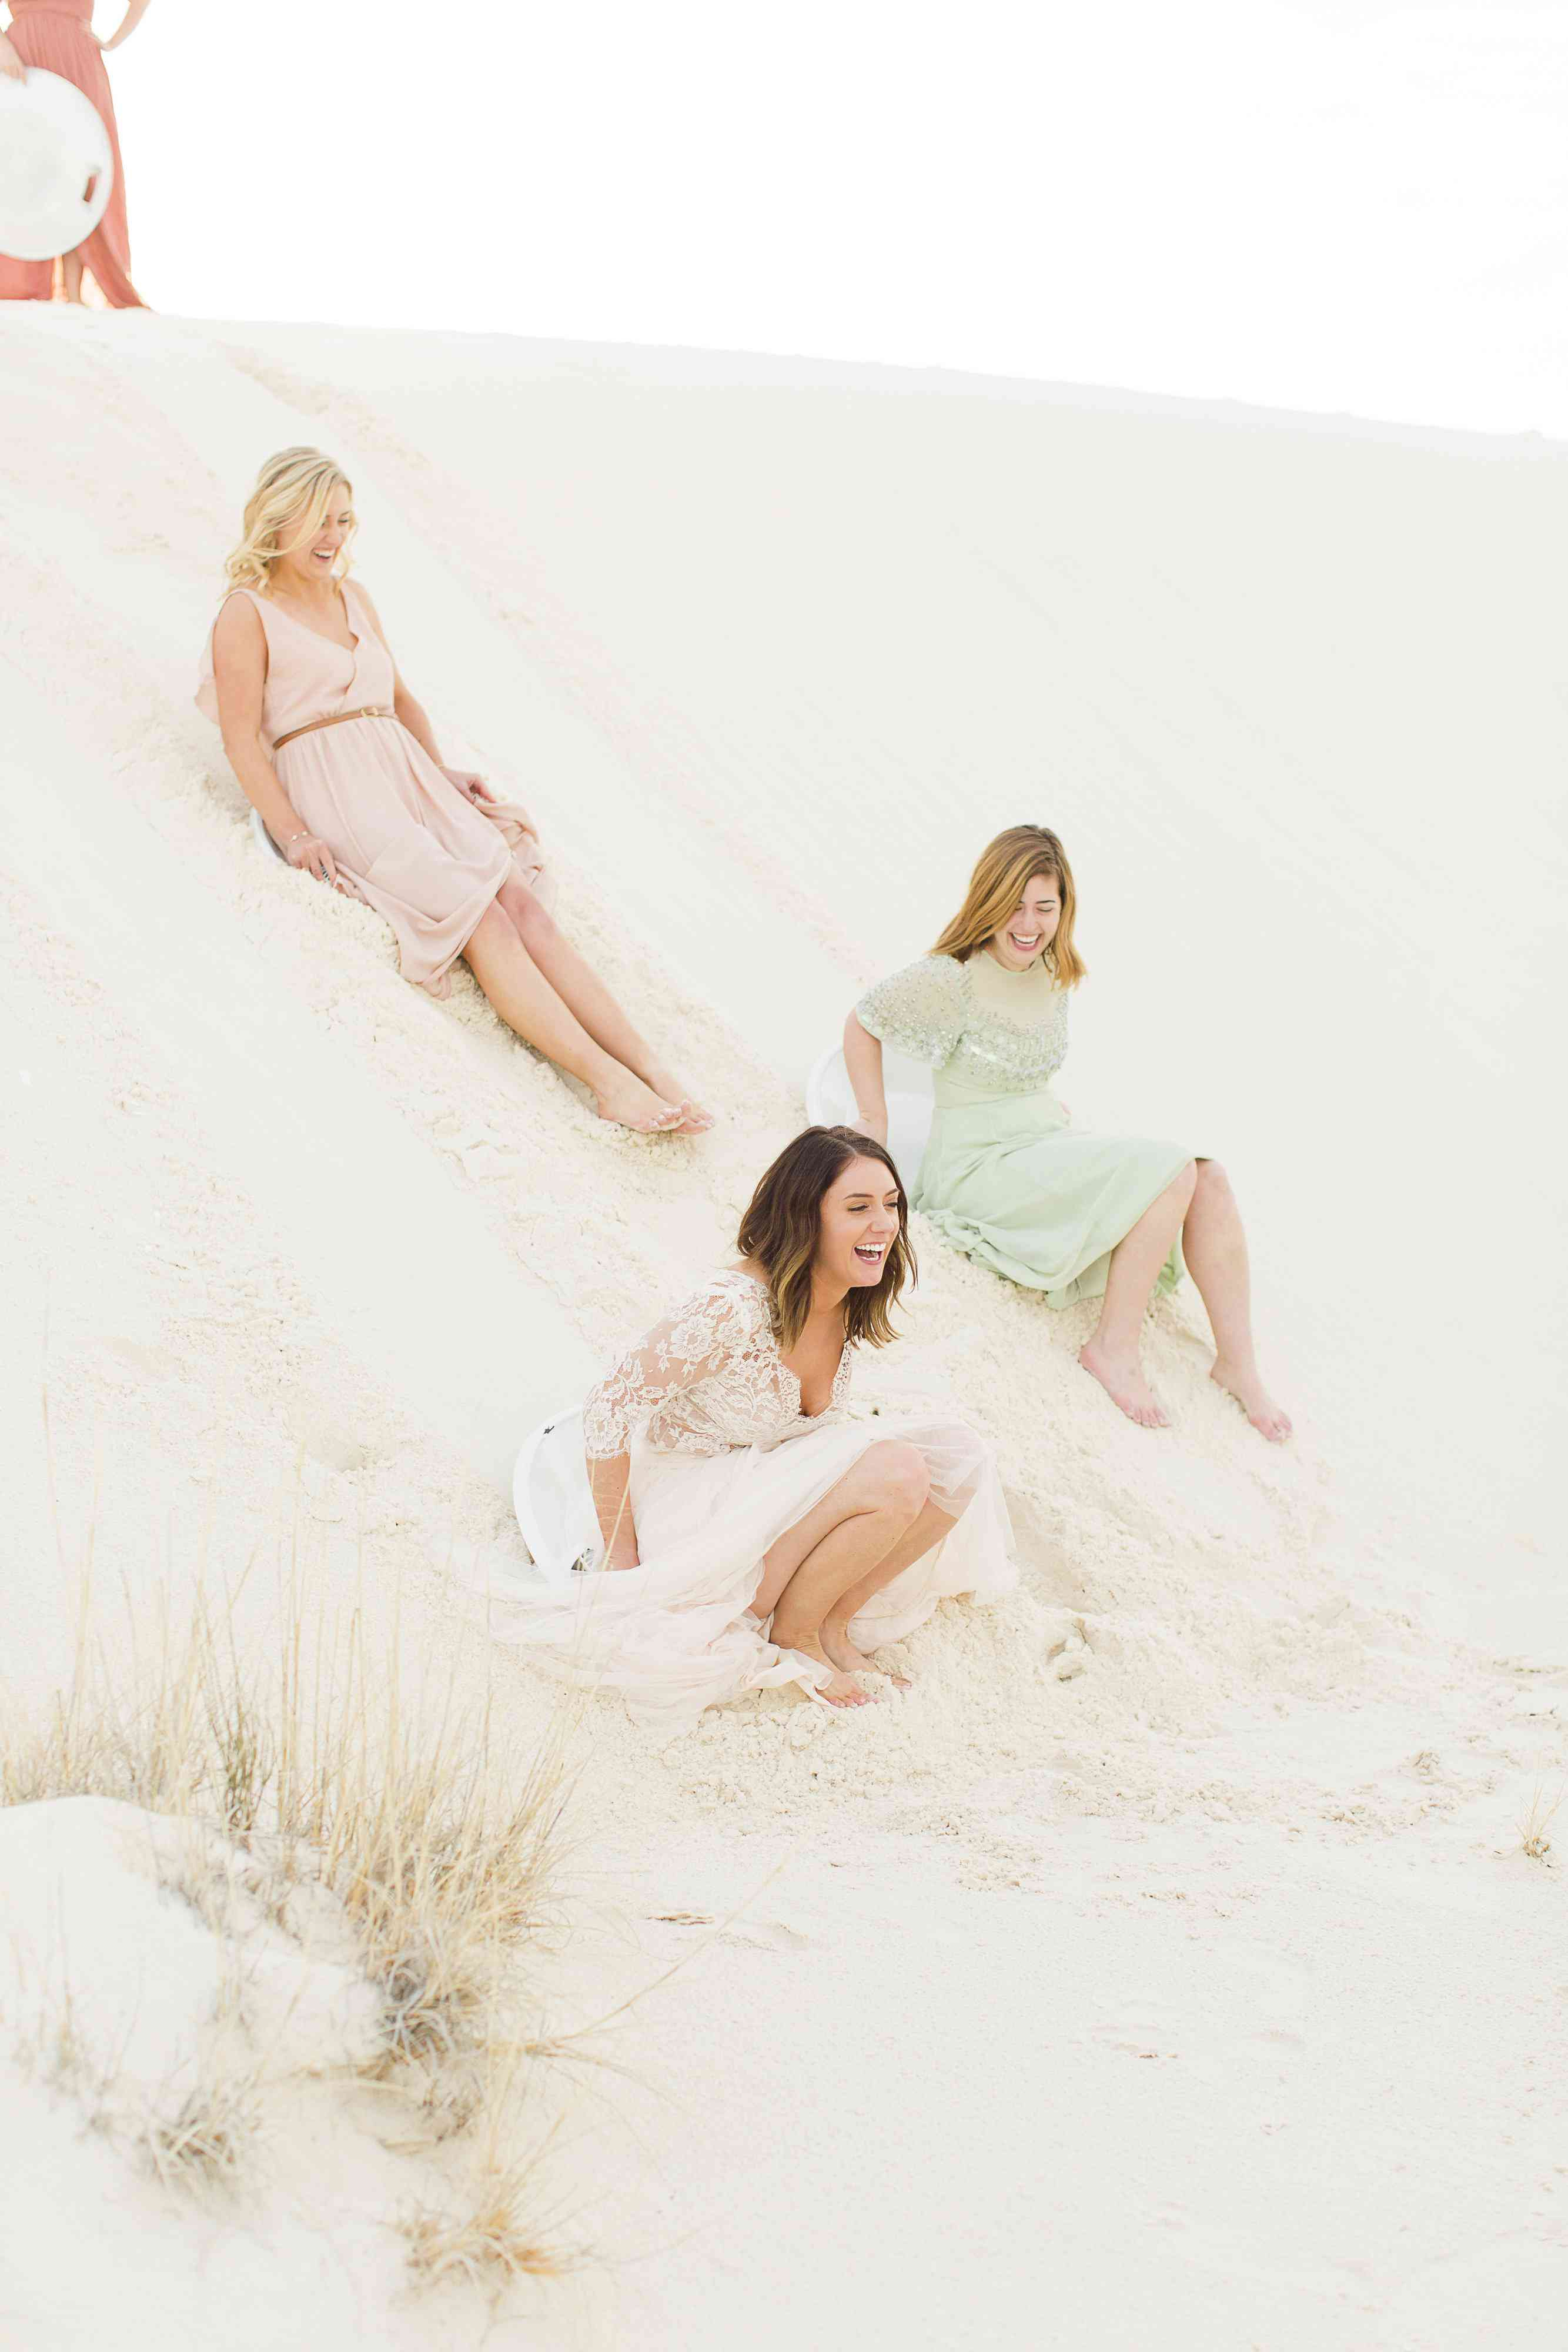 Bride Slides Down Sand Dune